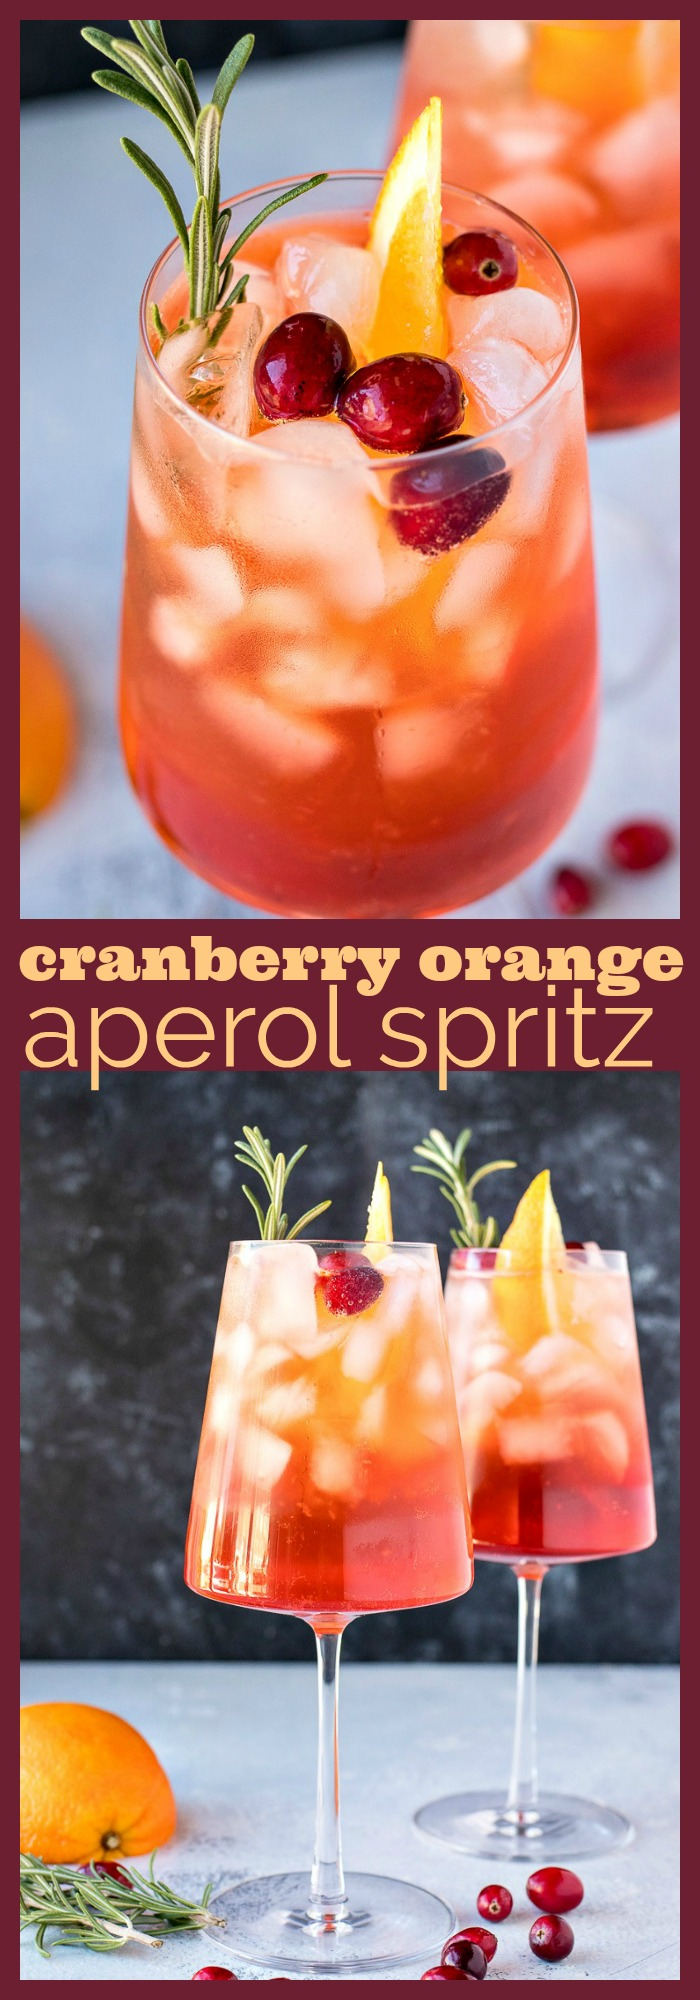 Cranberry Orange Aperol Spritz photo collage